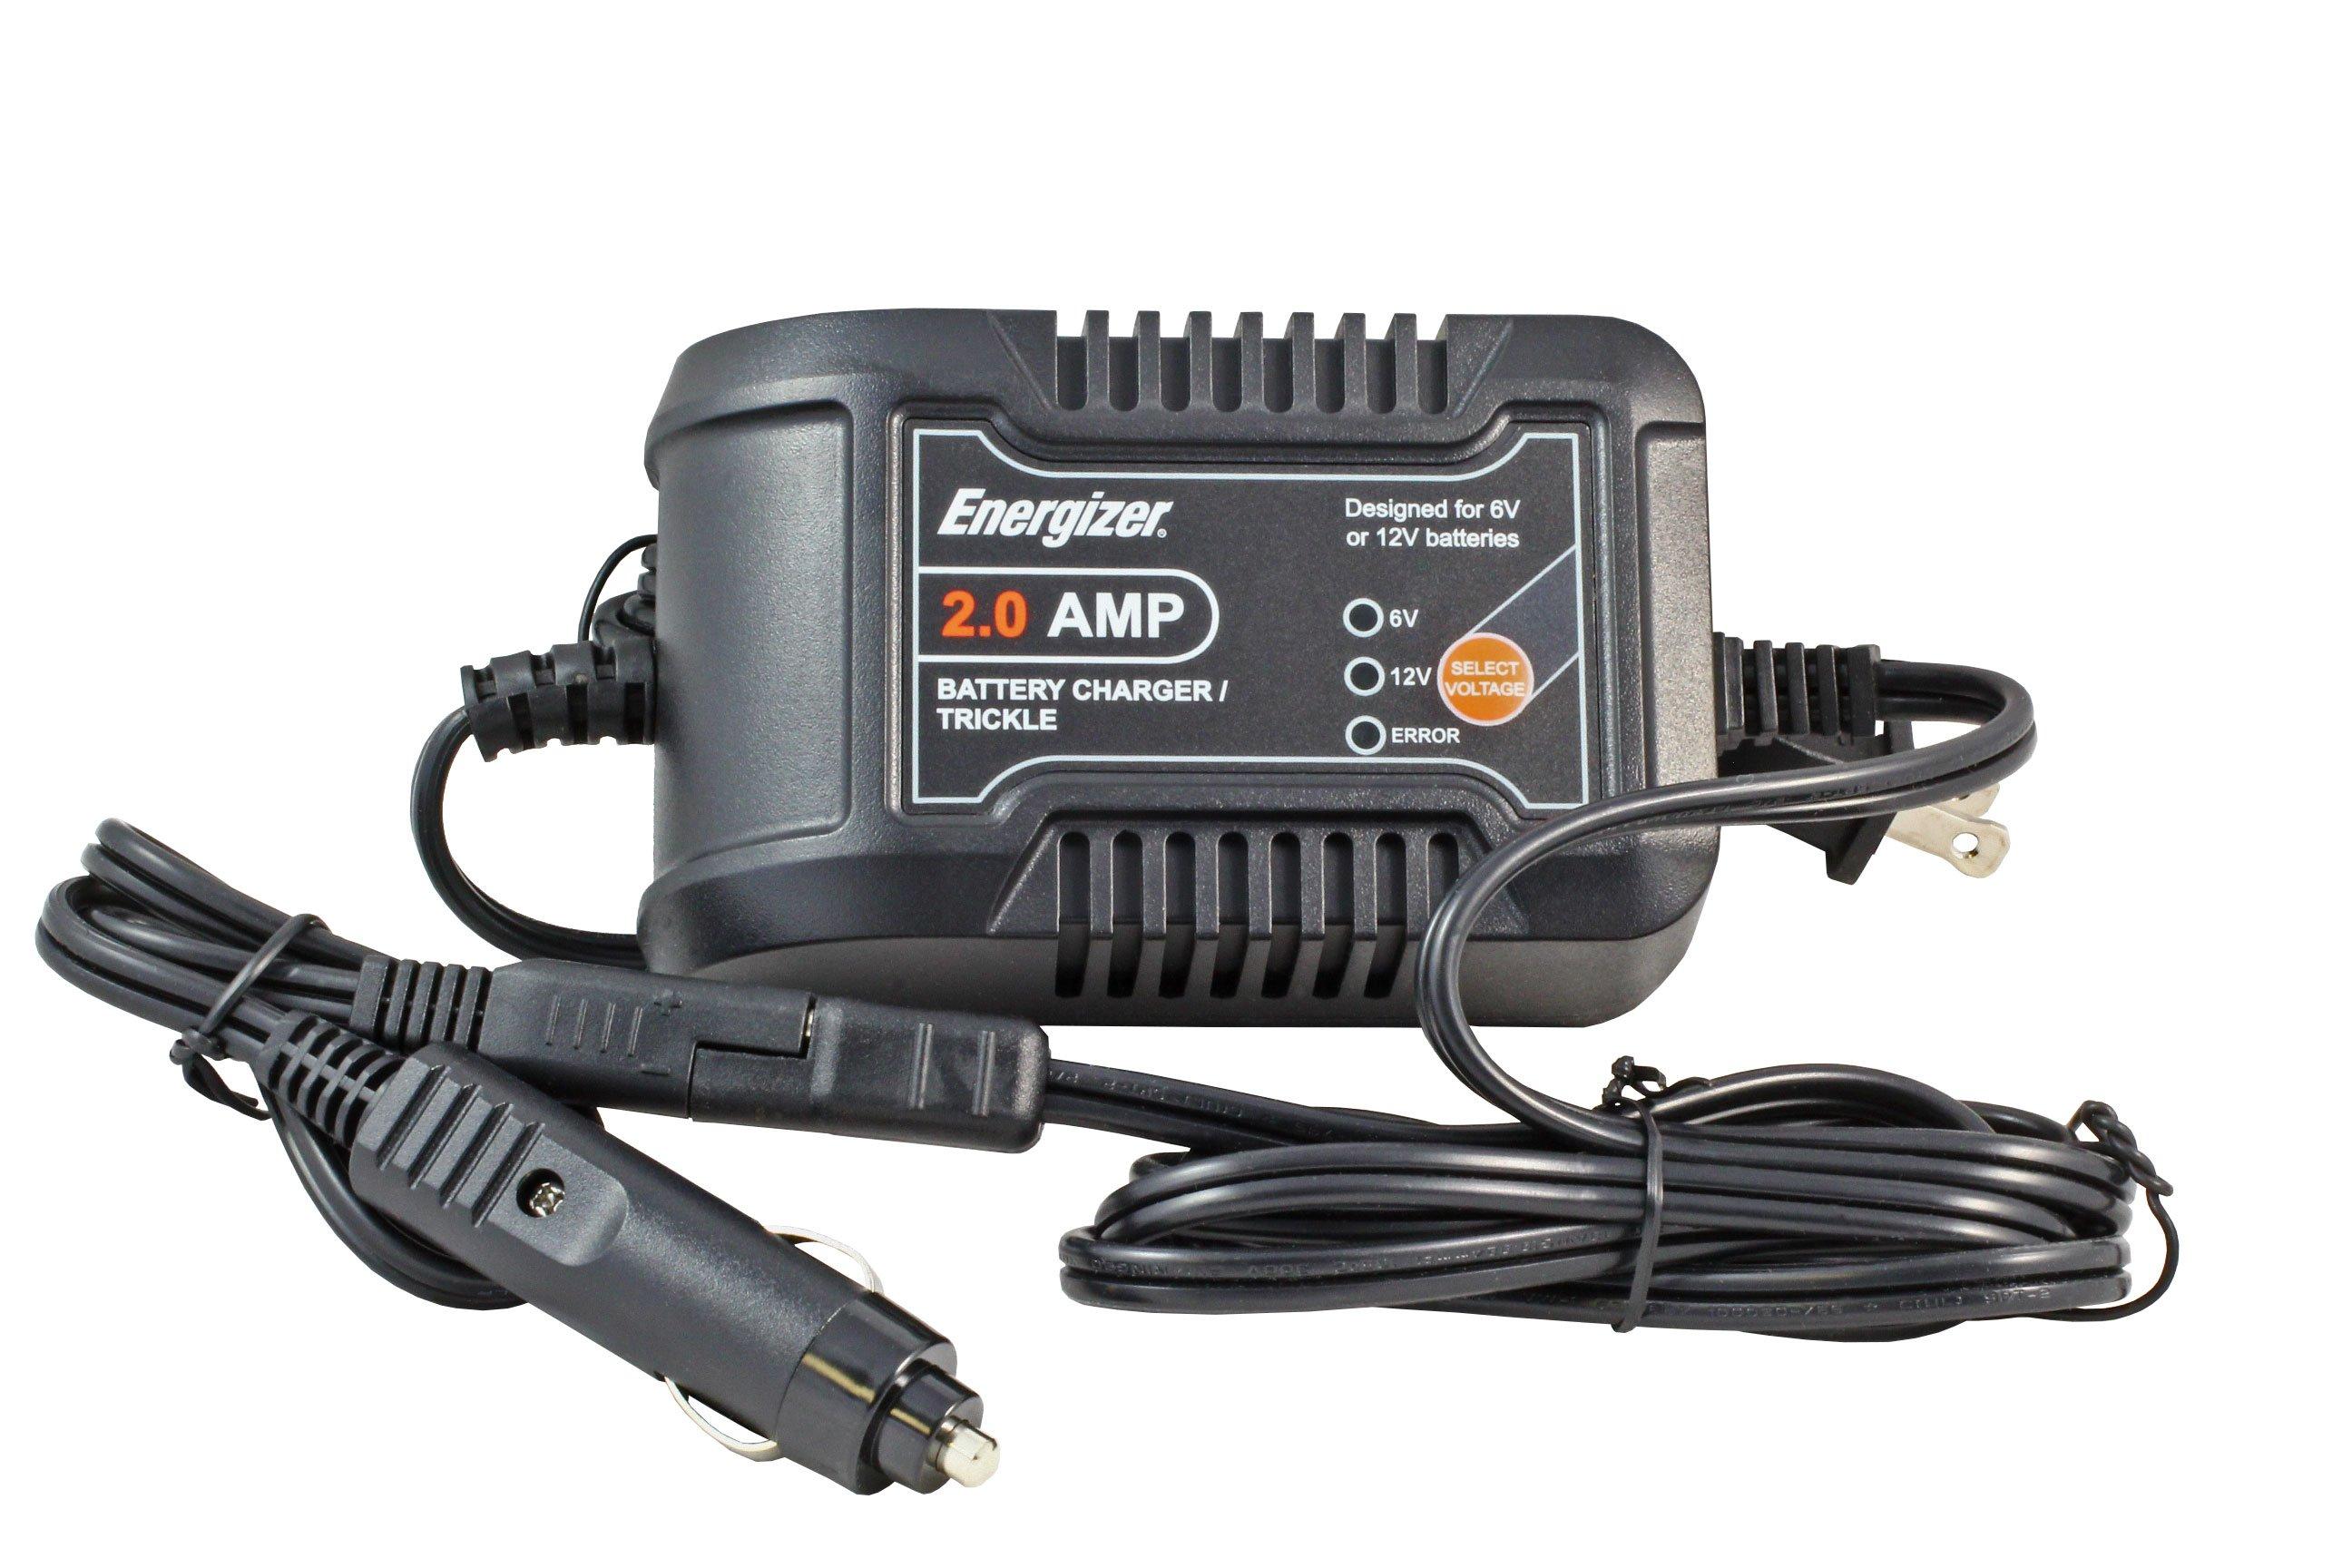 Energizer 6/12 Volt, 2 Amp Battery Charger with Cigarette ...